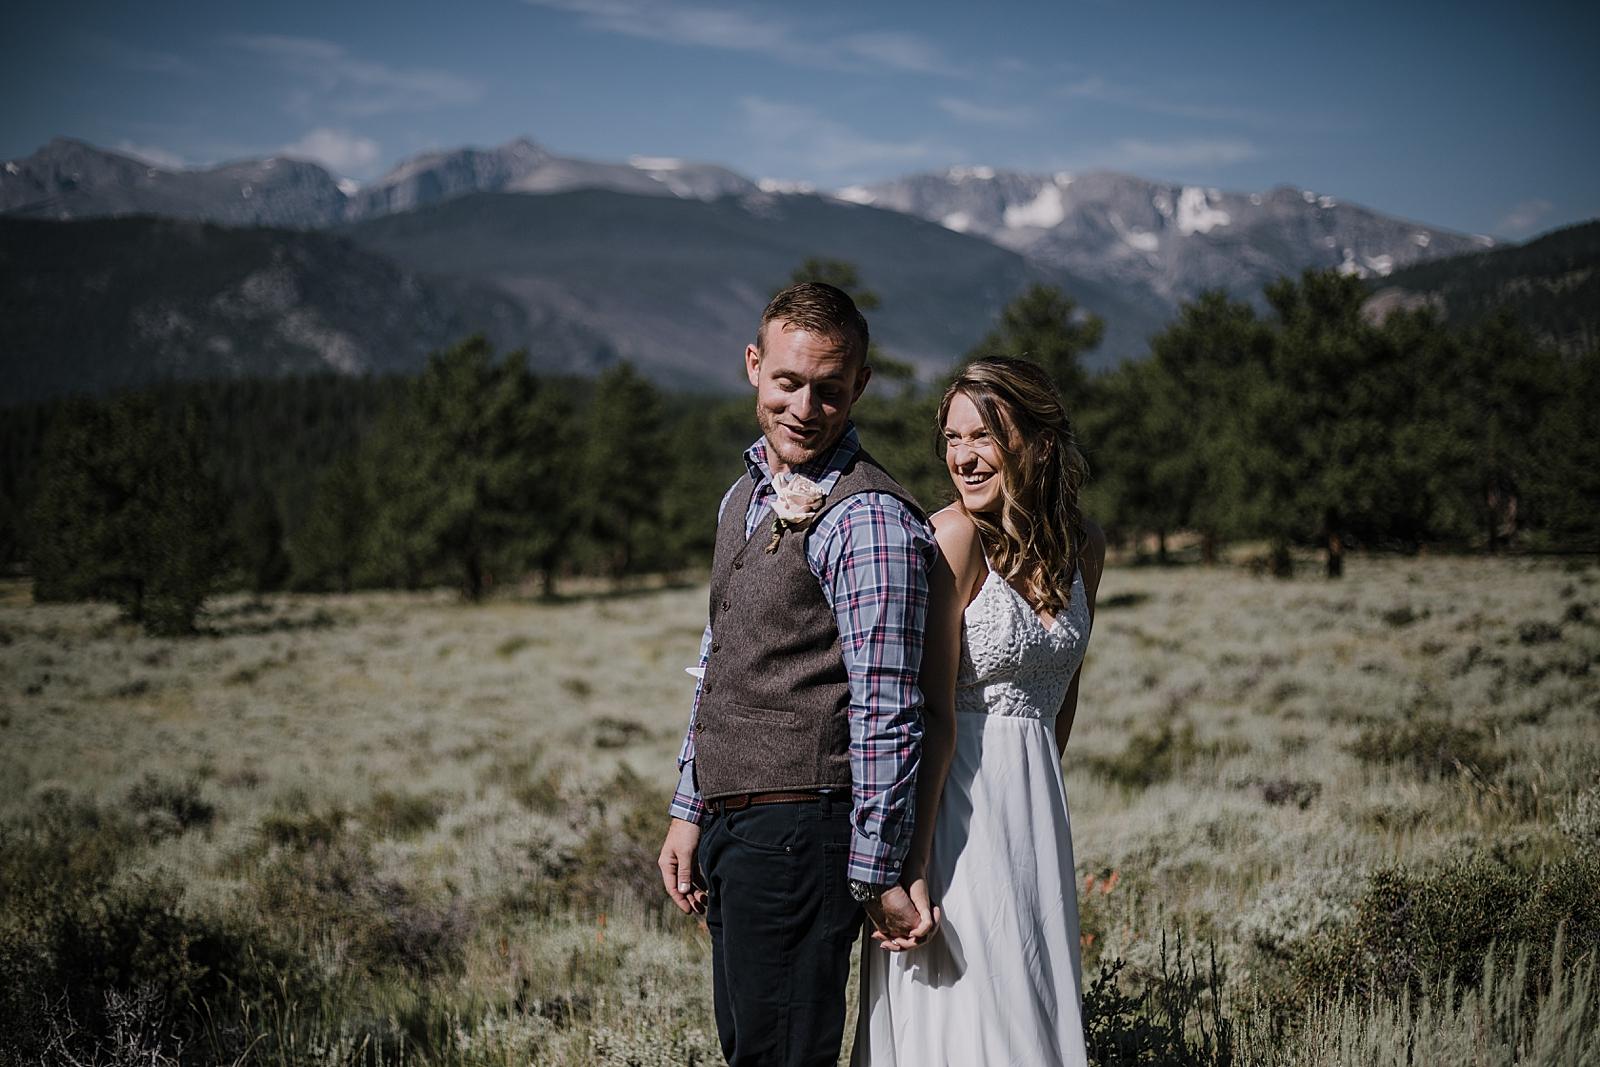 couple laughing, RMNP elopement ceremony, rocky mountain national park elopement, 3M curves elopement, self solemnizing, self solemnization, long's peak, summer hiking elopement, estes park elopement